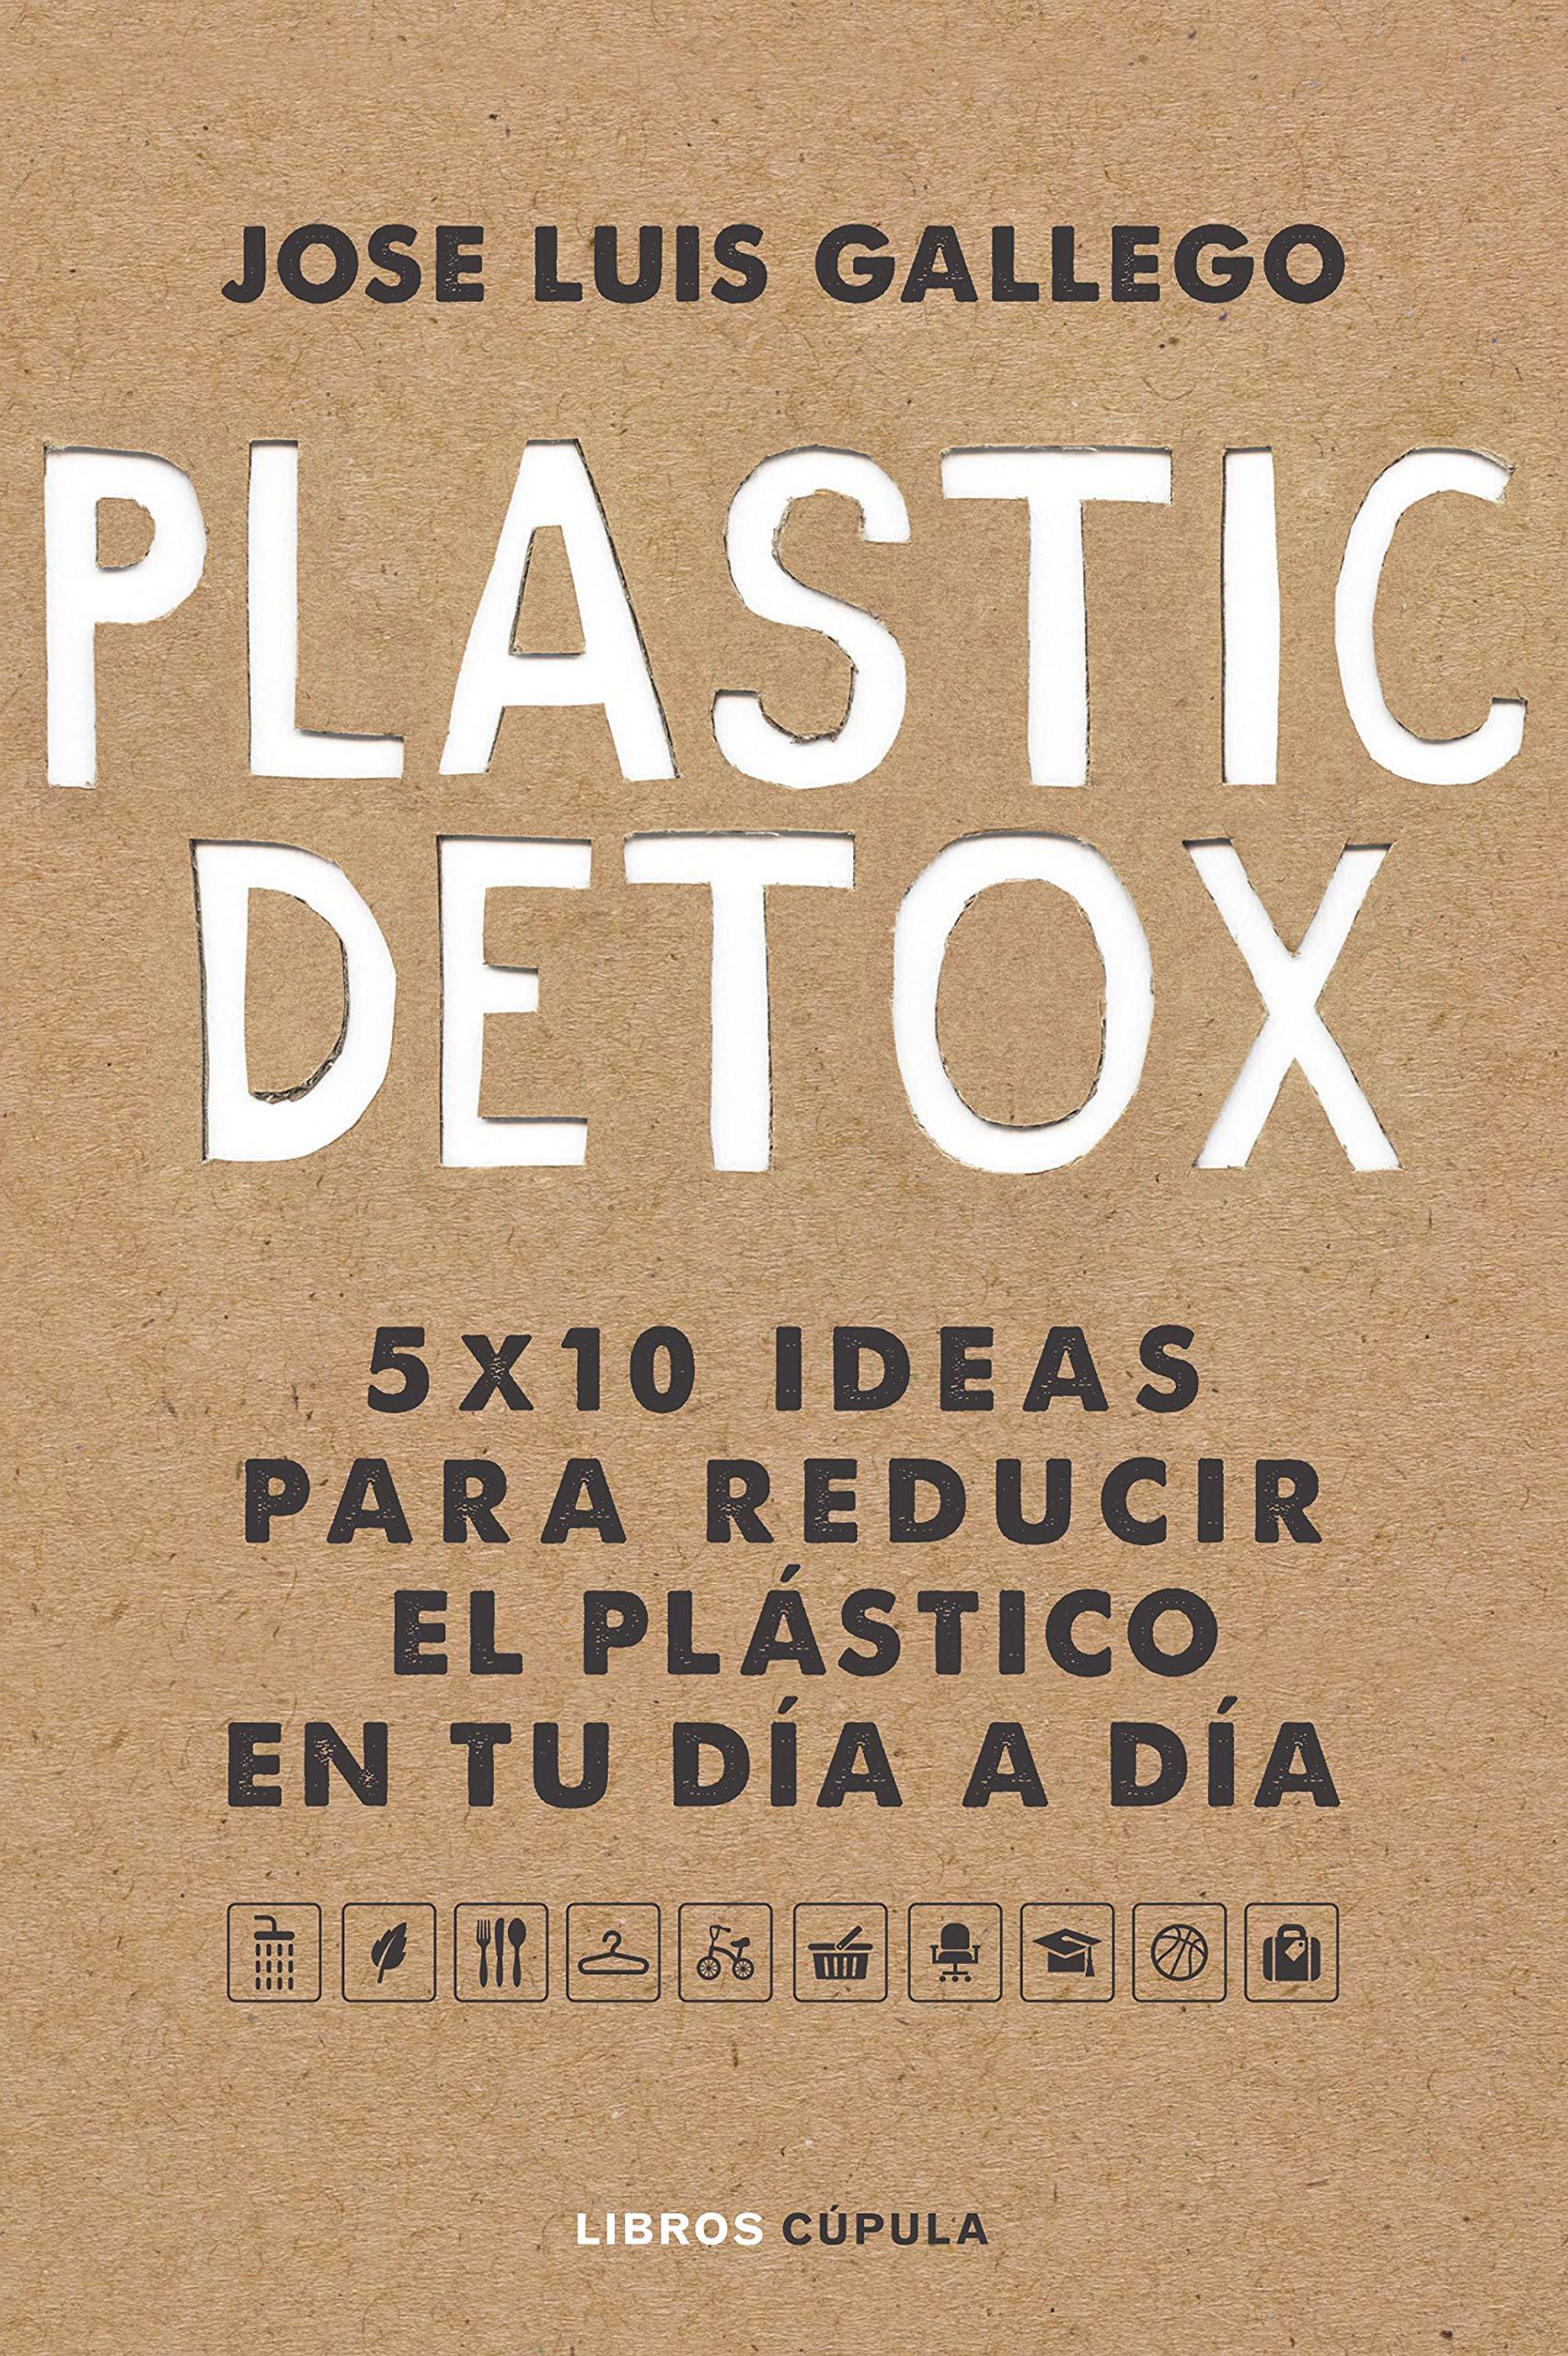 Plastic detox (Otros)